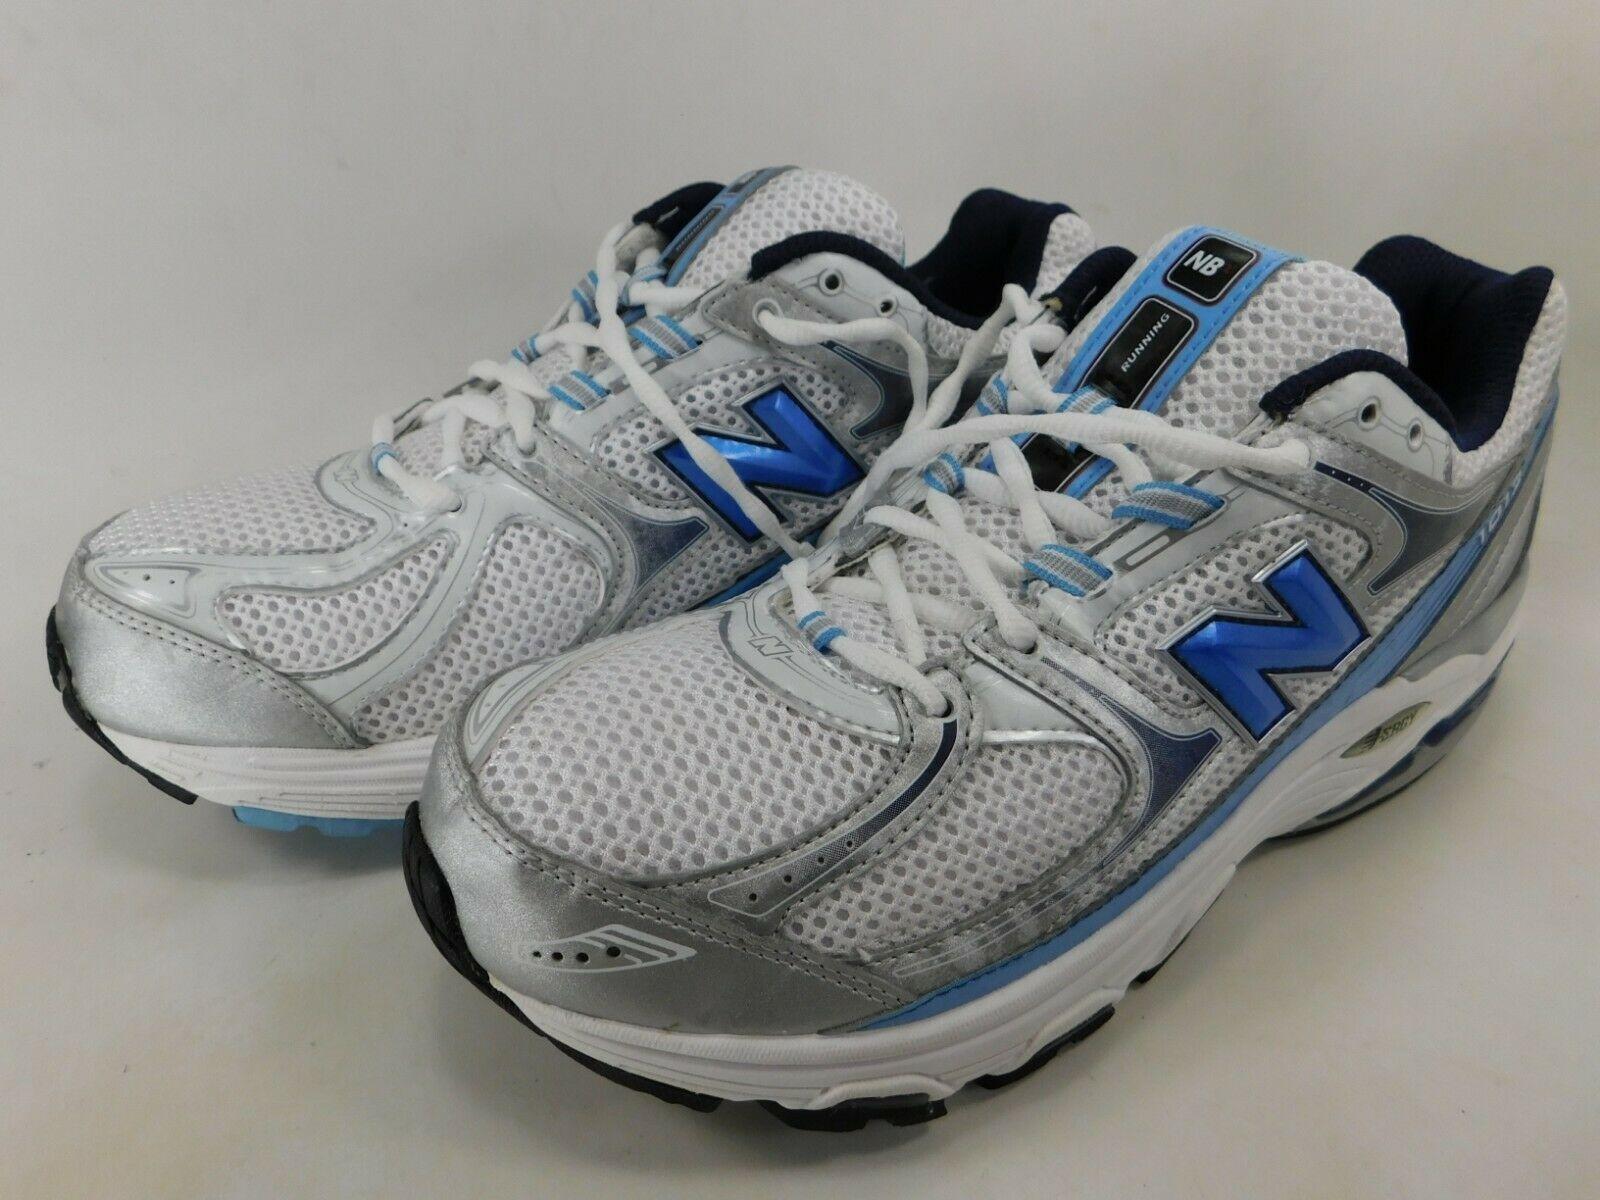 New Balance 1012 Size US 12 M (B) EU 44 Women's Running Shoes White WR1012MC